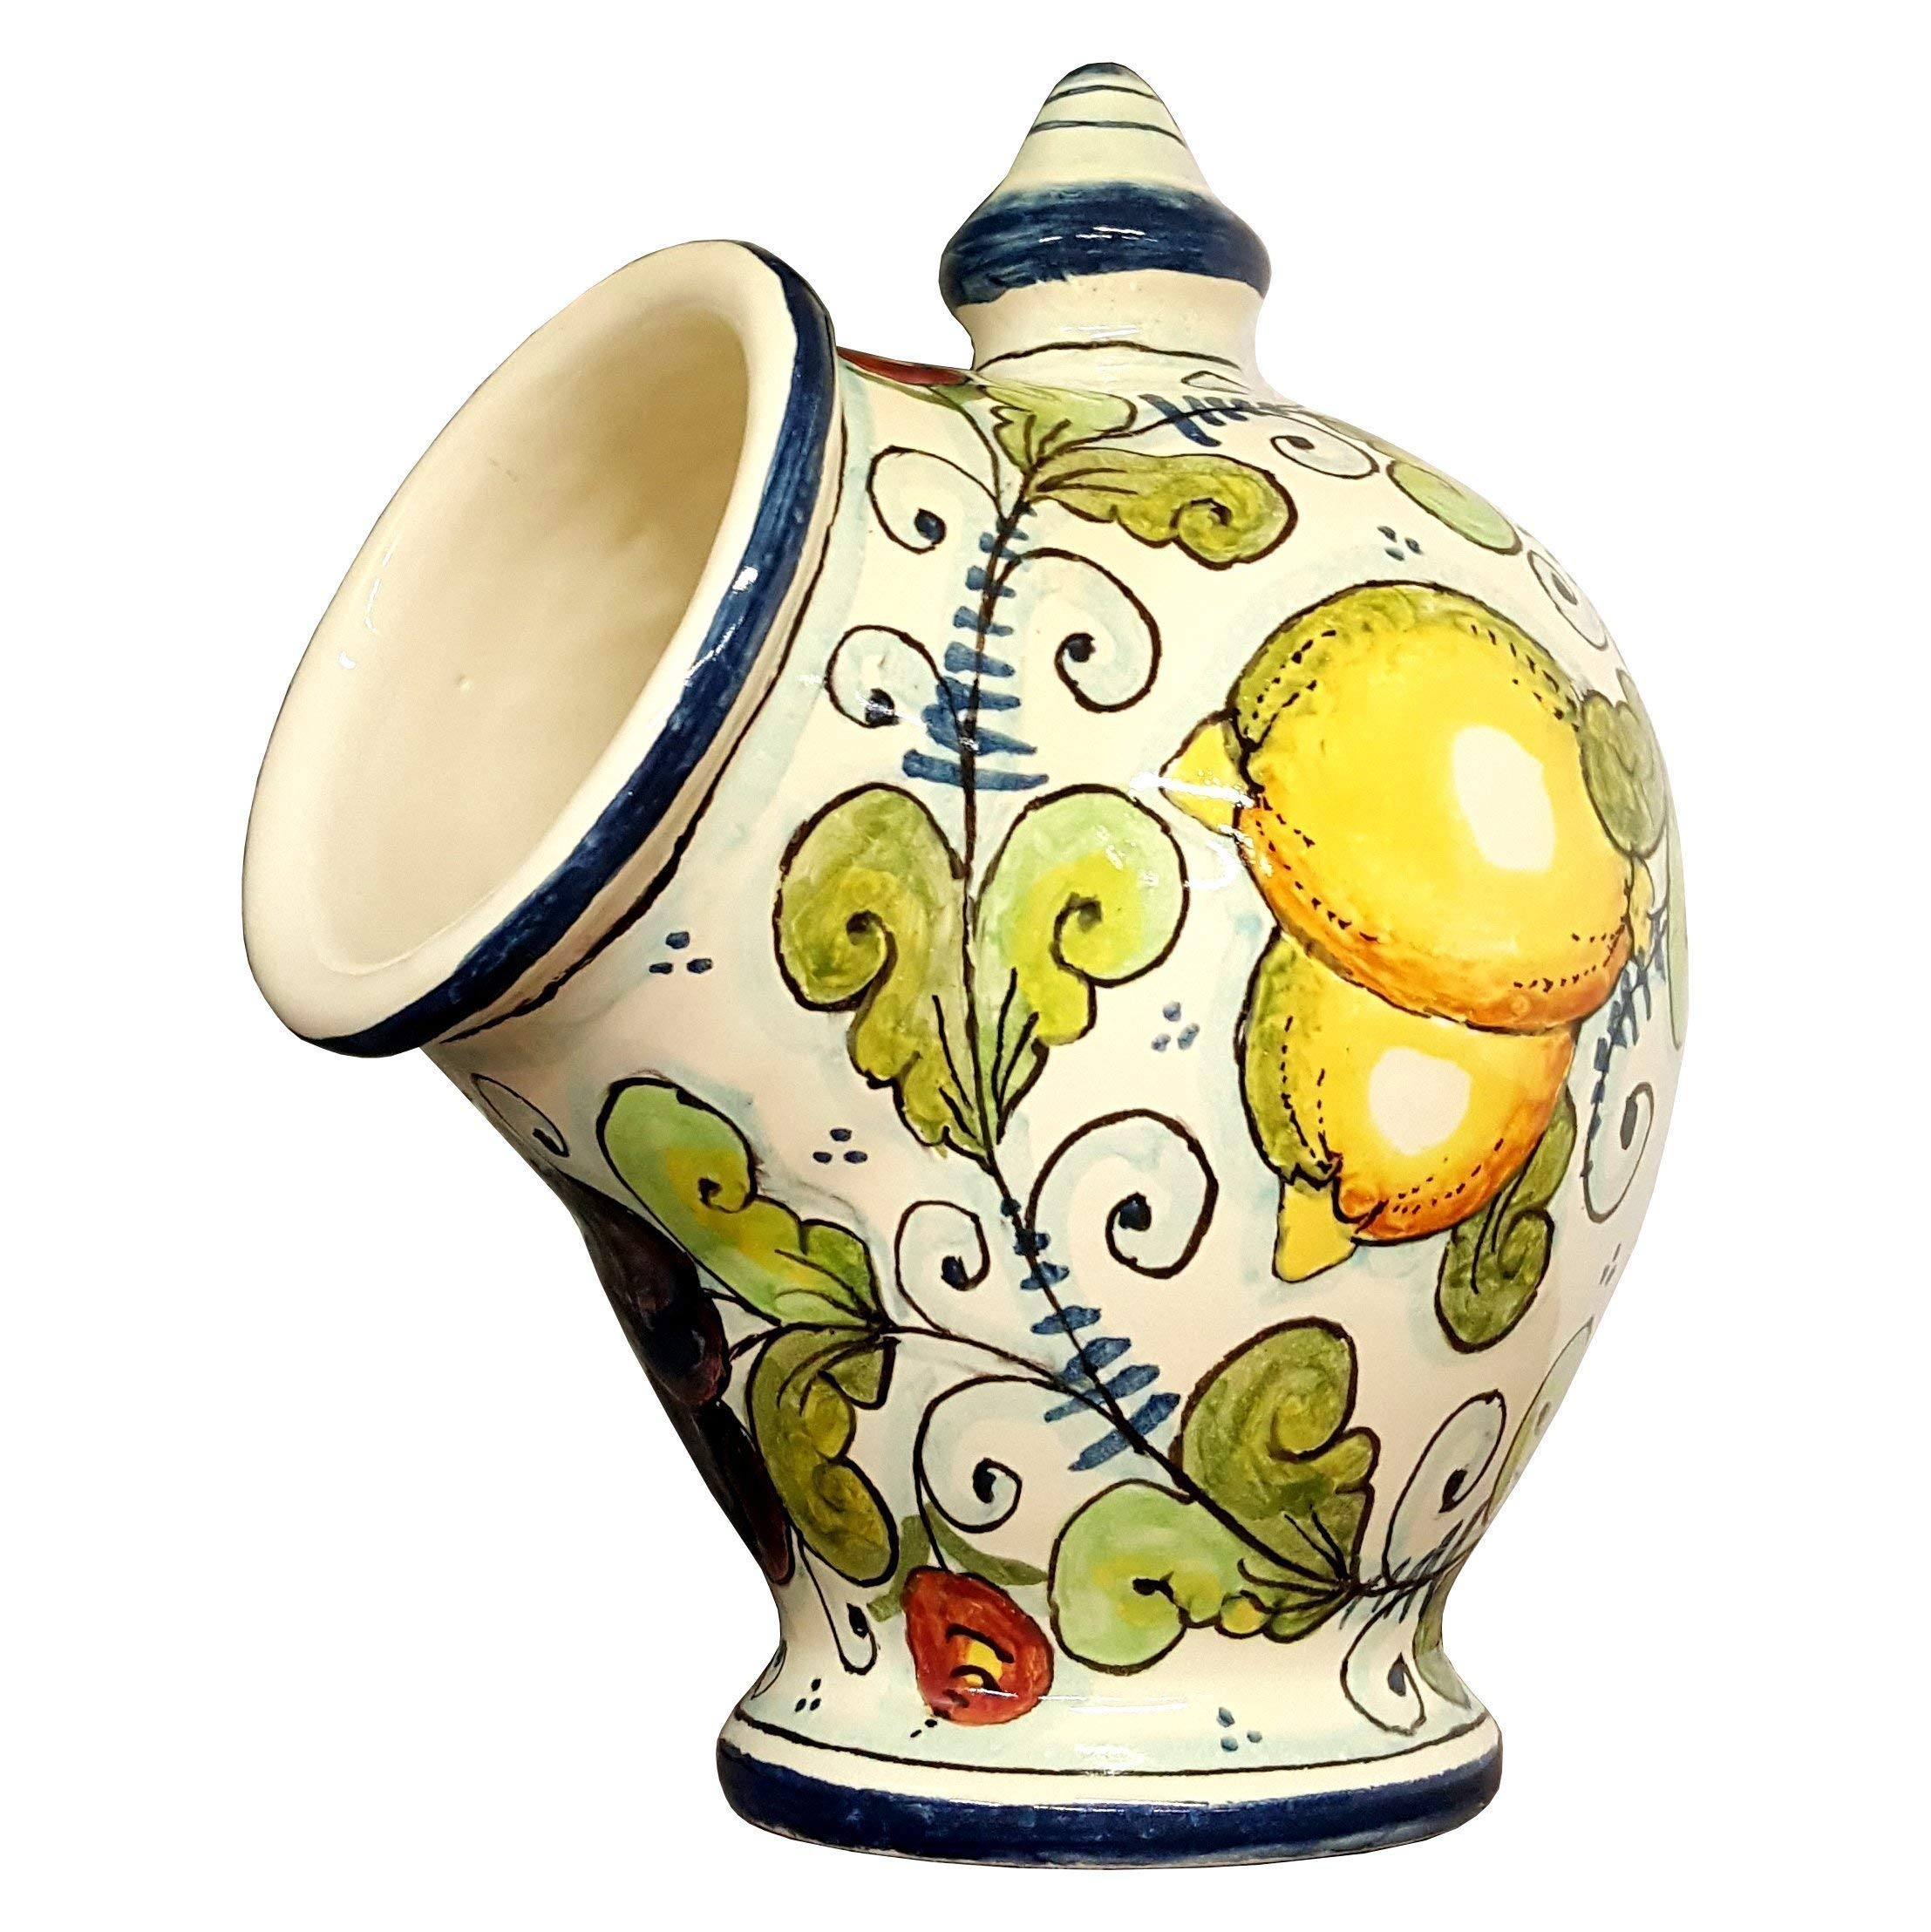 CERAMICHE D'ARTE PARRINI- Italian Ceramic Jar Salt Holder Sponge Hand Painted Decorated Fruit Made in ITALY Tuscan Art Pottery